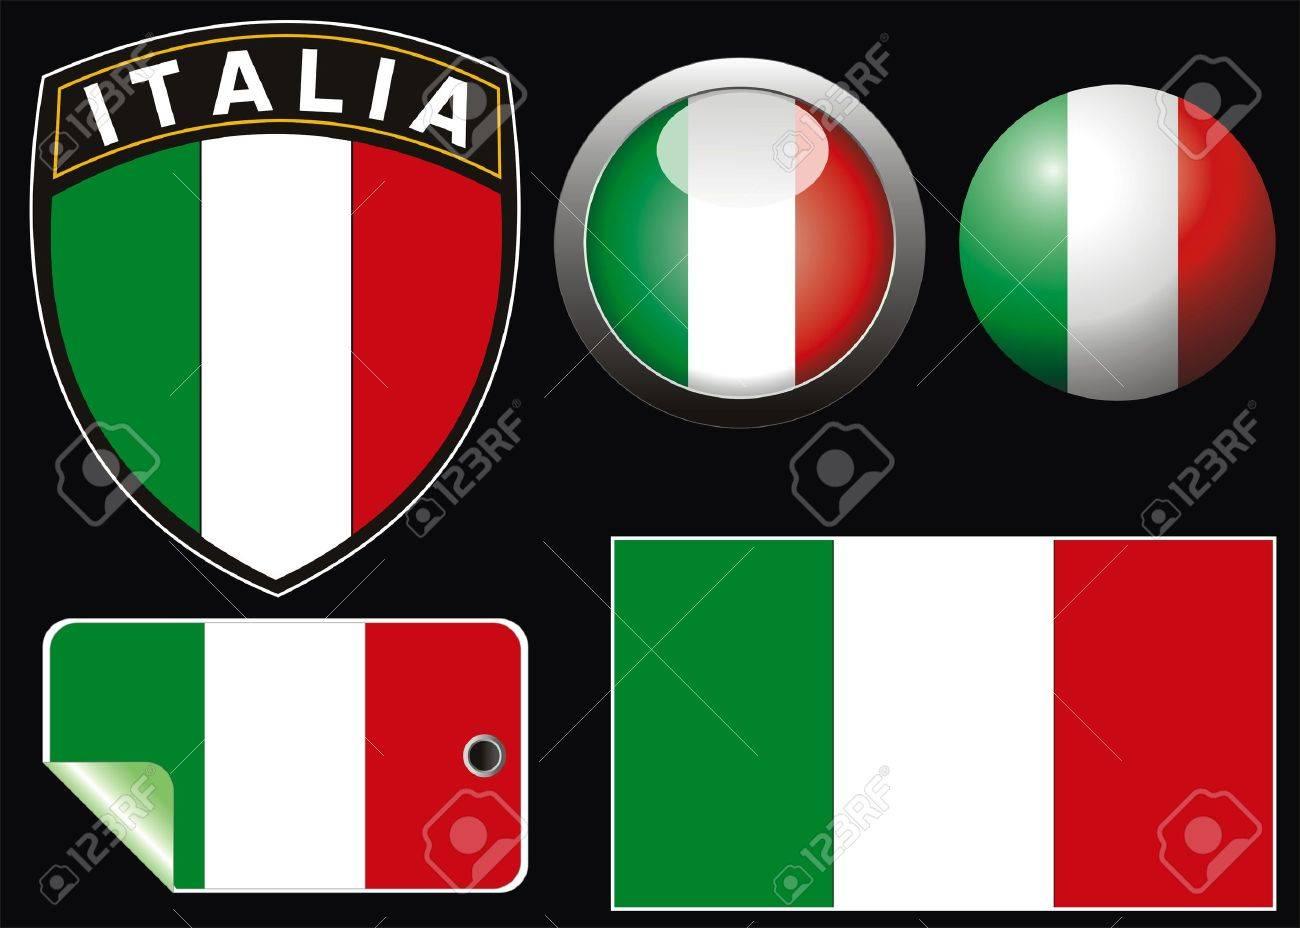 italian vector flag with aqua style and crest Stock Vector - 3995997